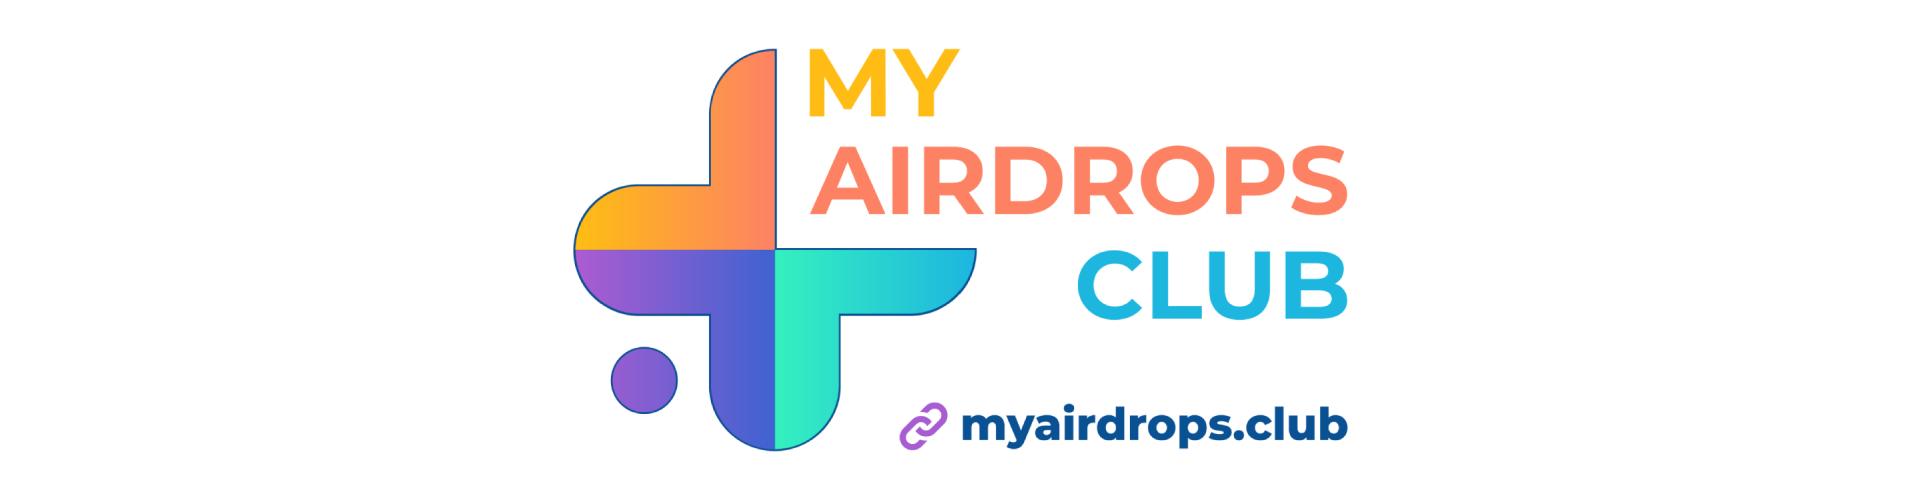 My Airdrops Club